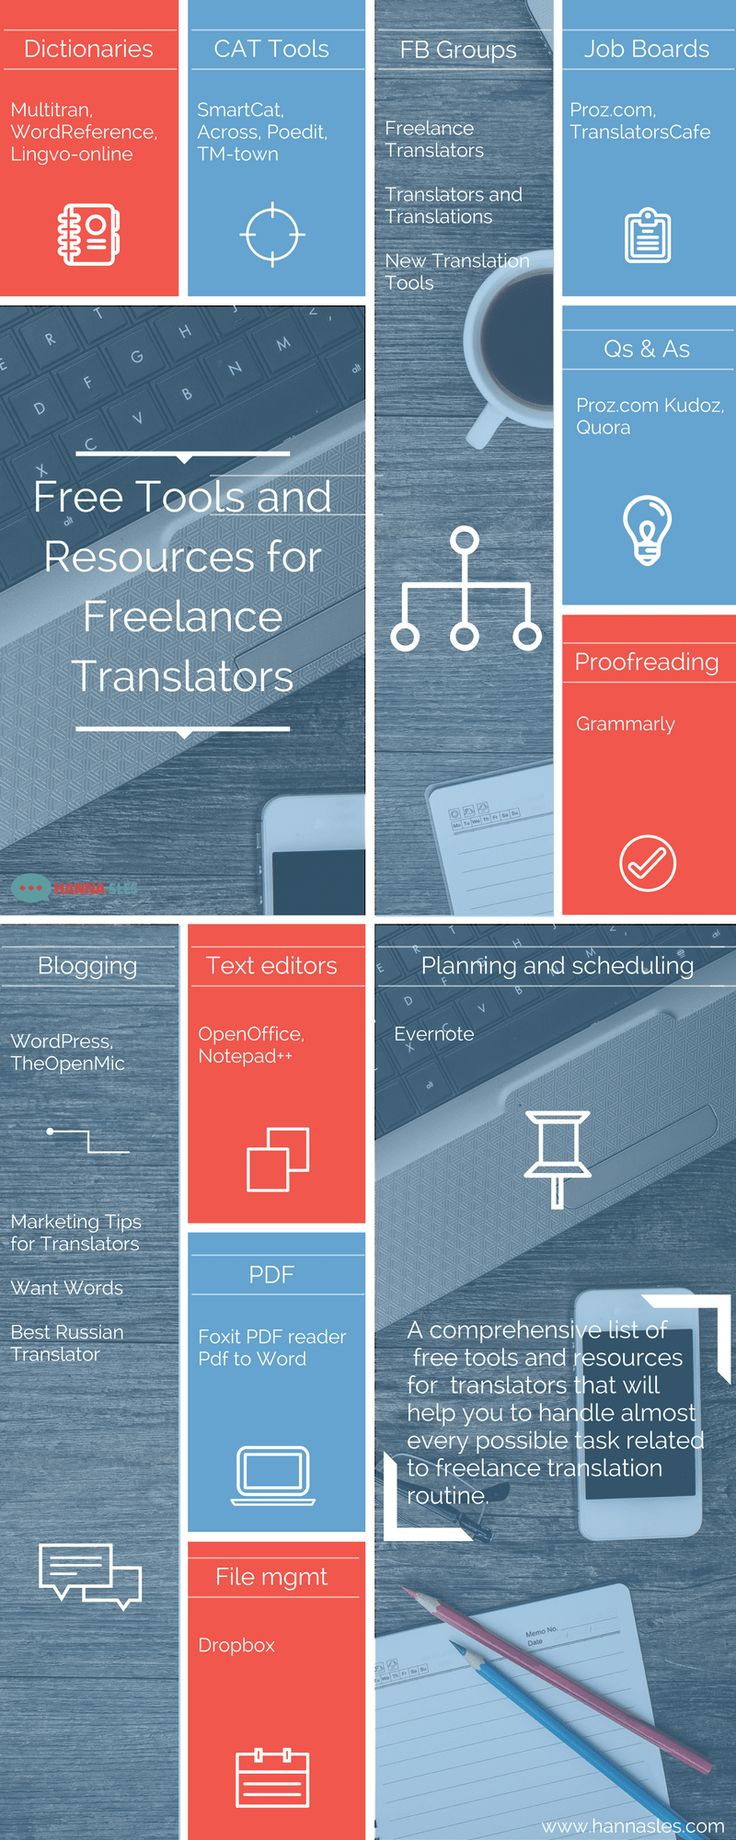 Freelance translation jobs russian english работа удмуртия удаленно